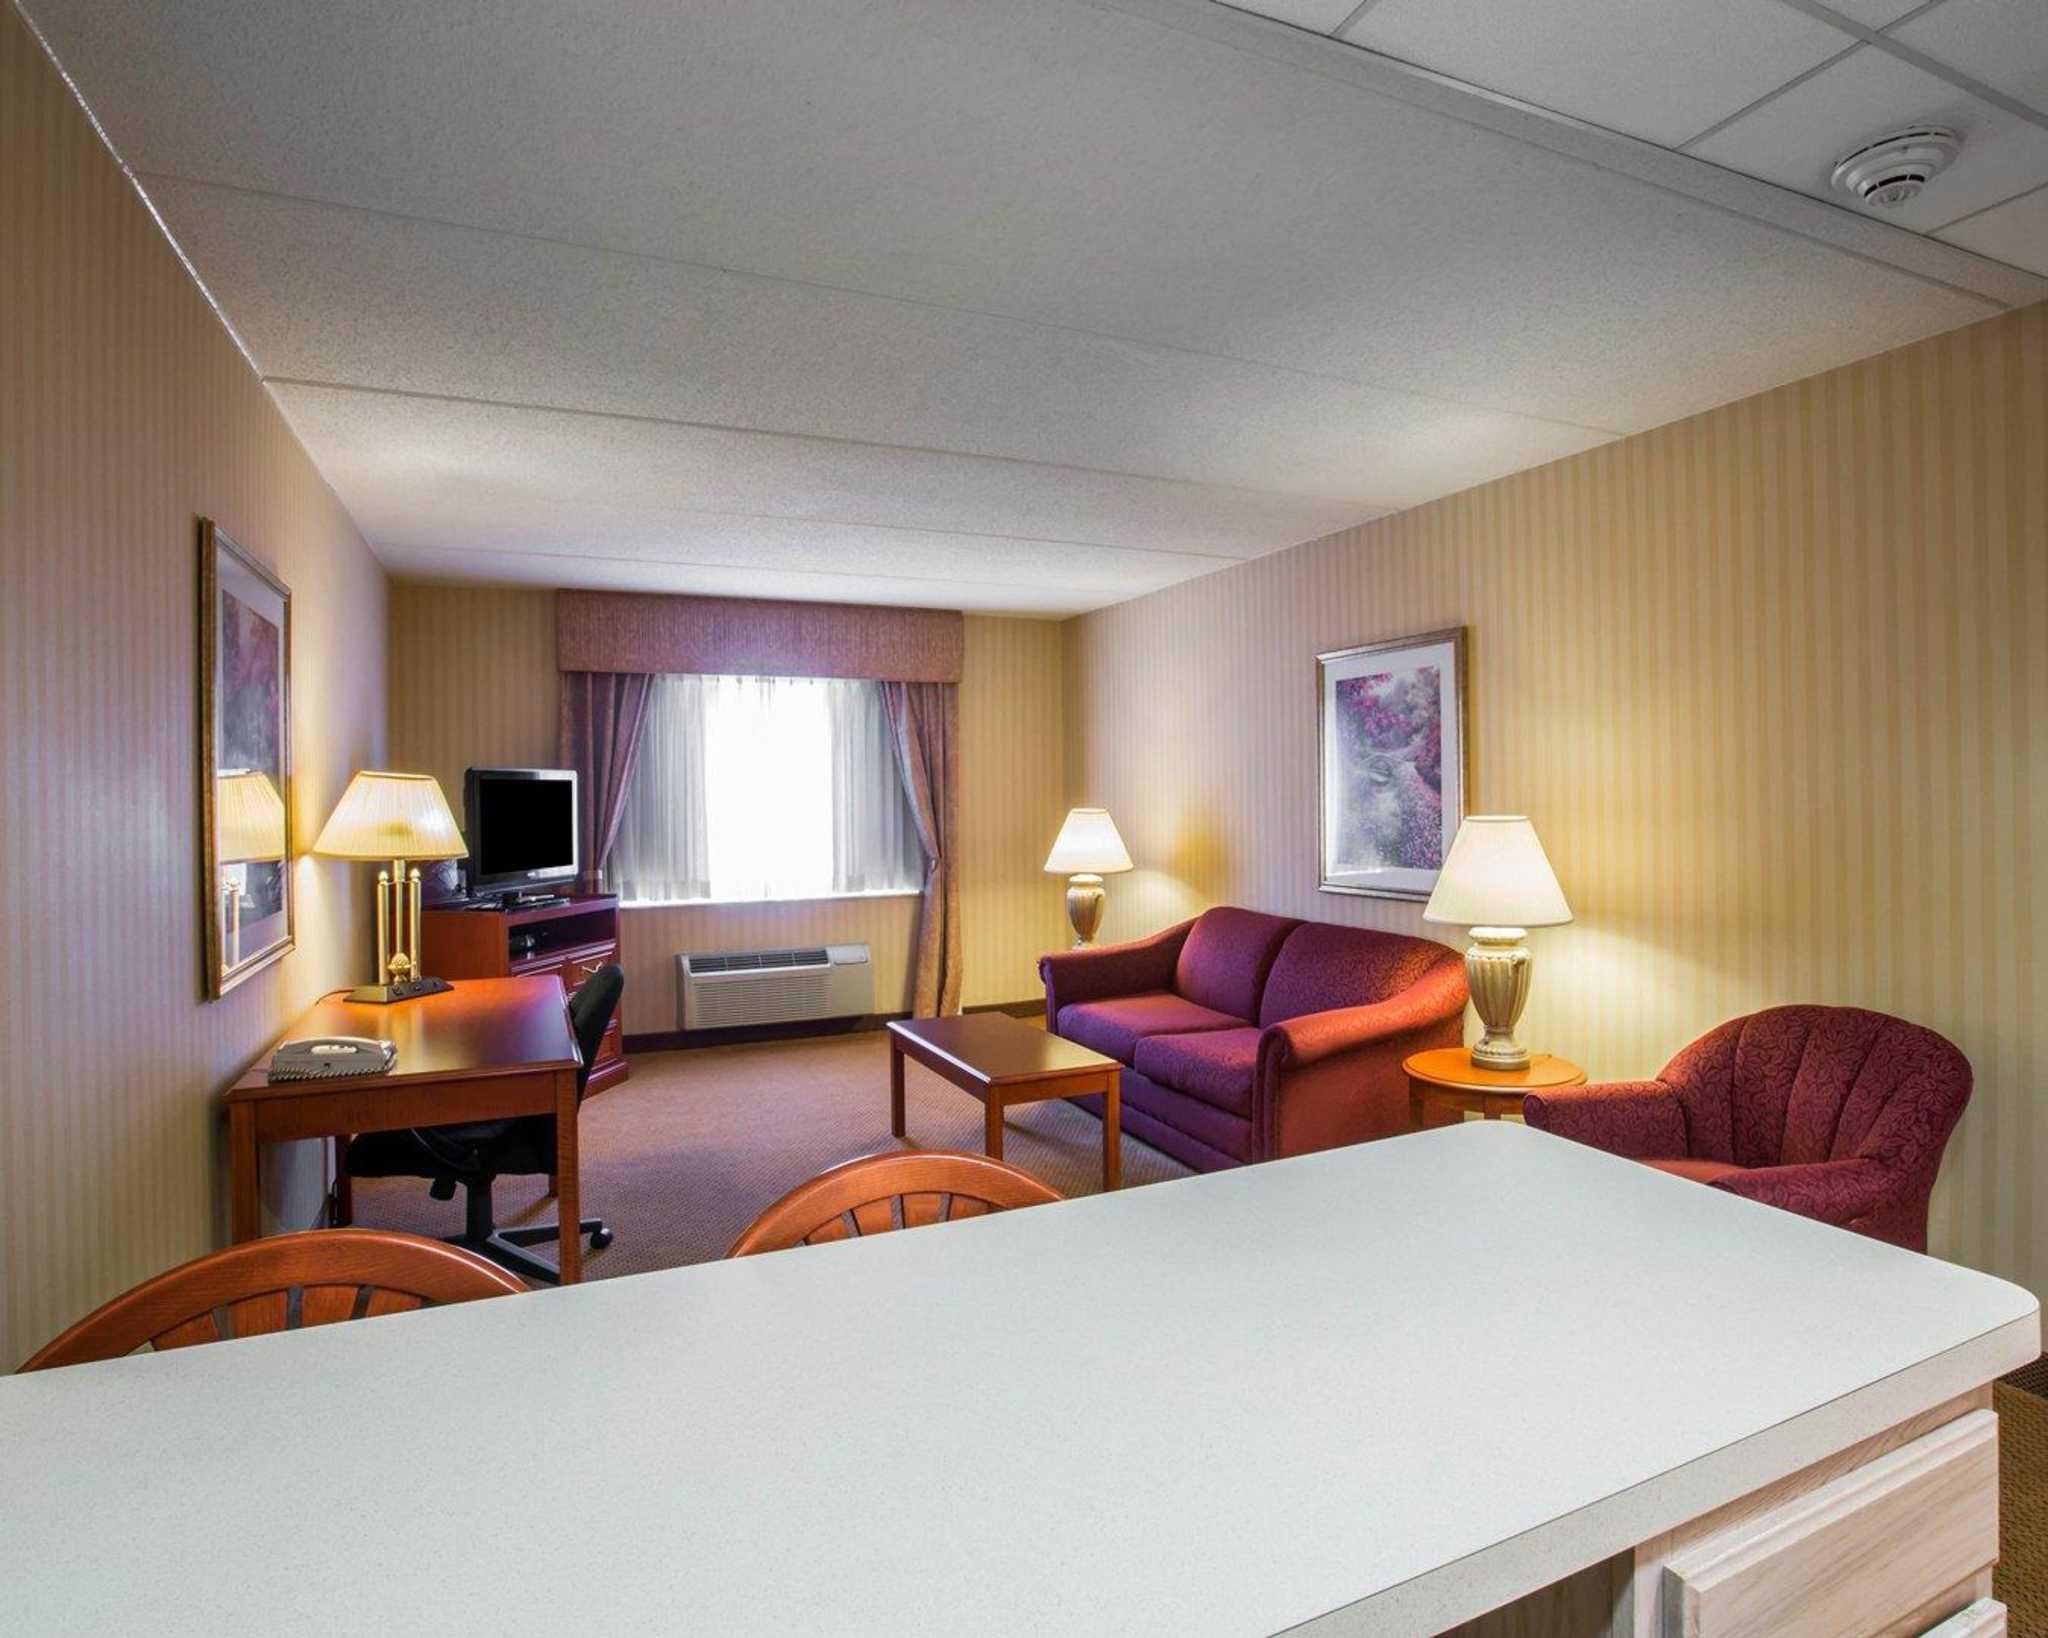 Comfort Inn Amp Suites In Hawthorne Ny 10532